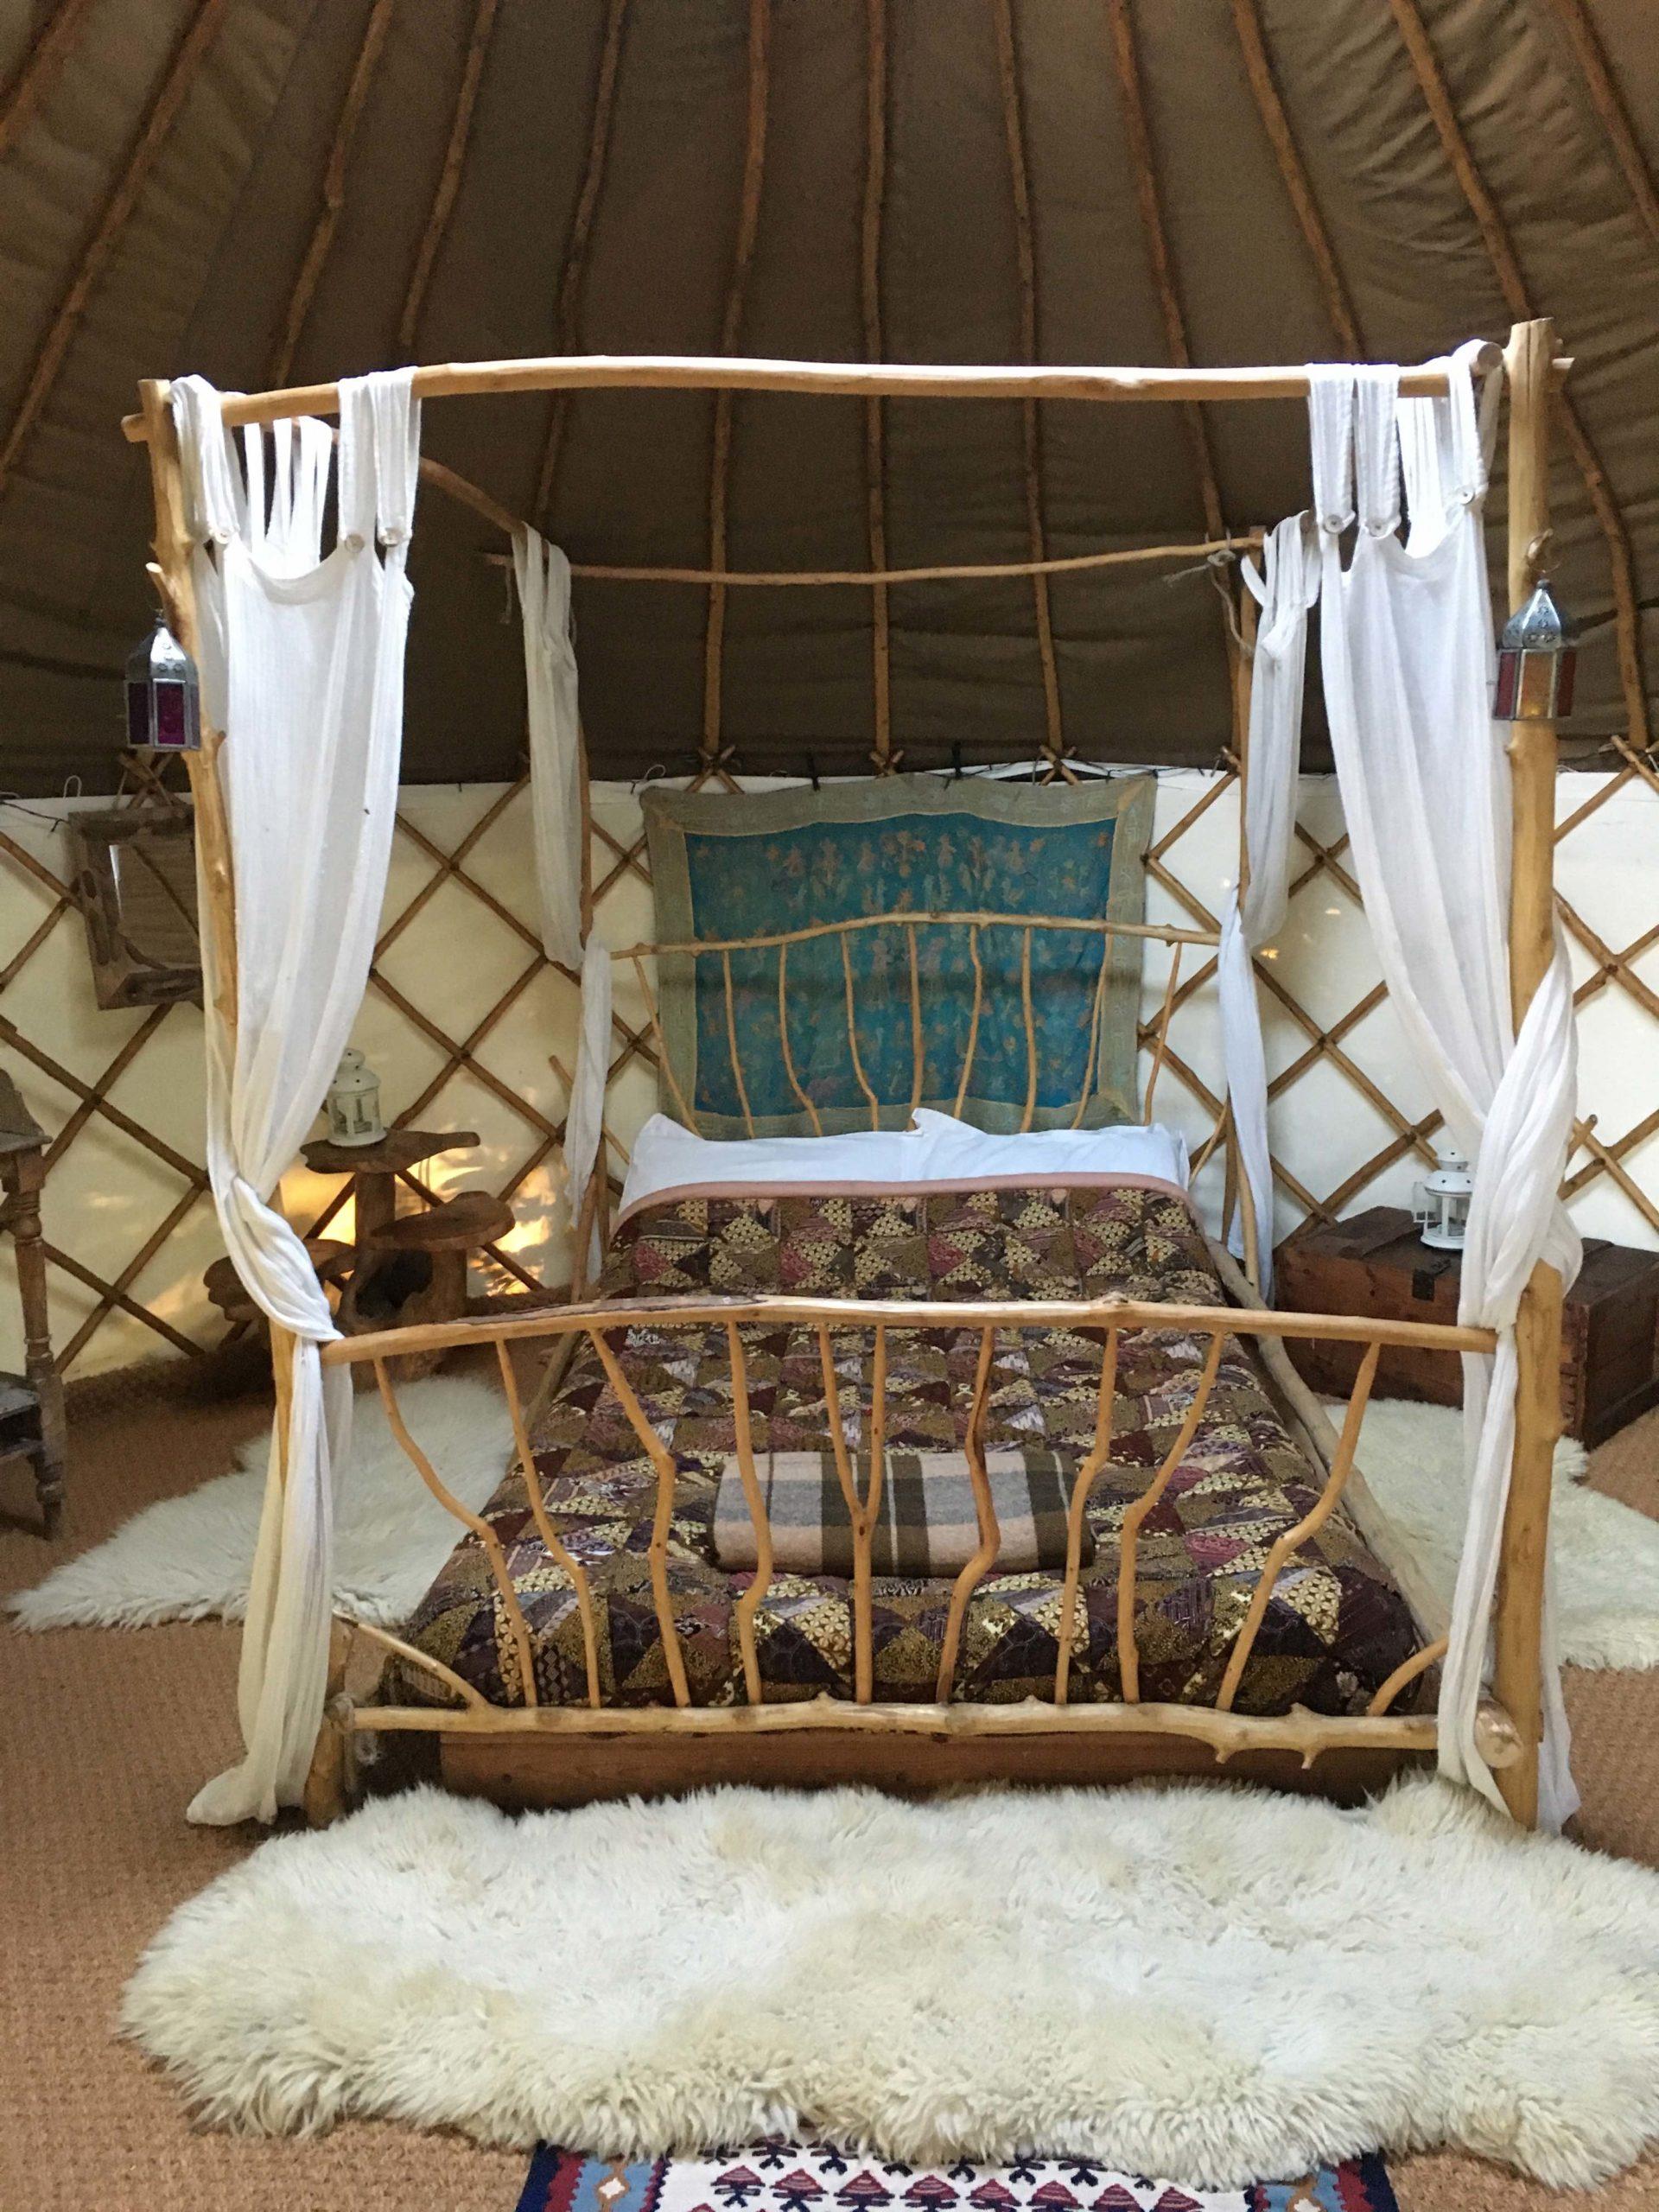 Staycation spot: Alde Garden Campsite